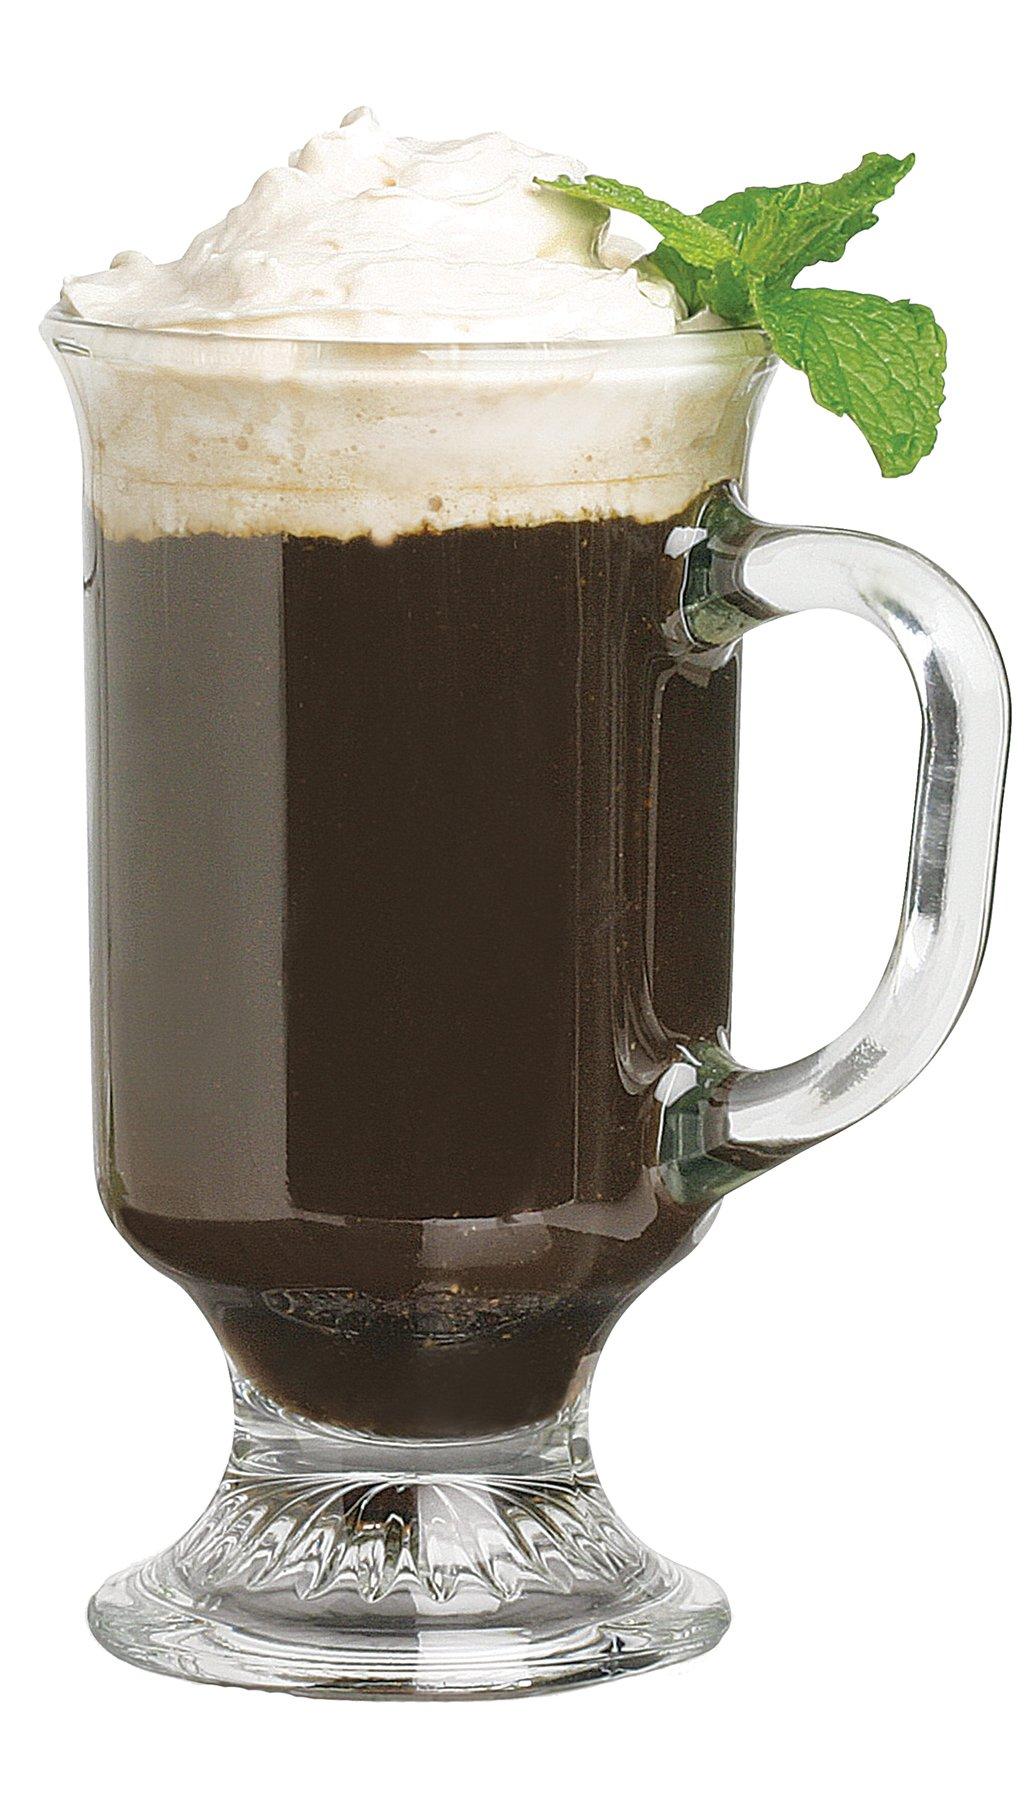 Anchor Hocking Irish Coffee Glass Coffee Mugs, 8 oz (Set of 12) by Anchor Hocking (Image #2)